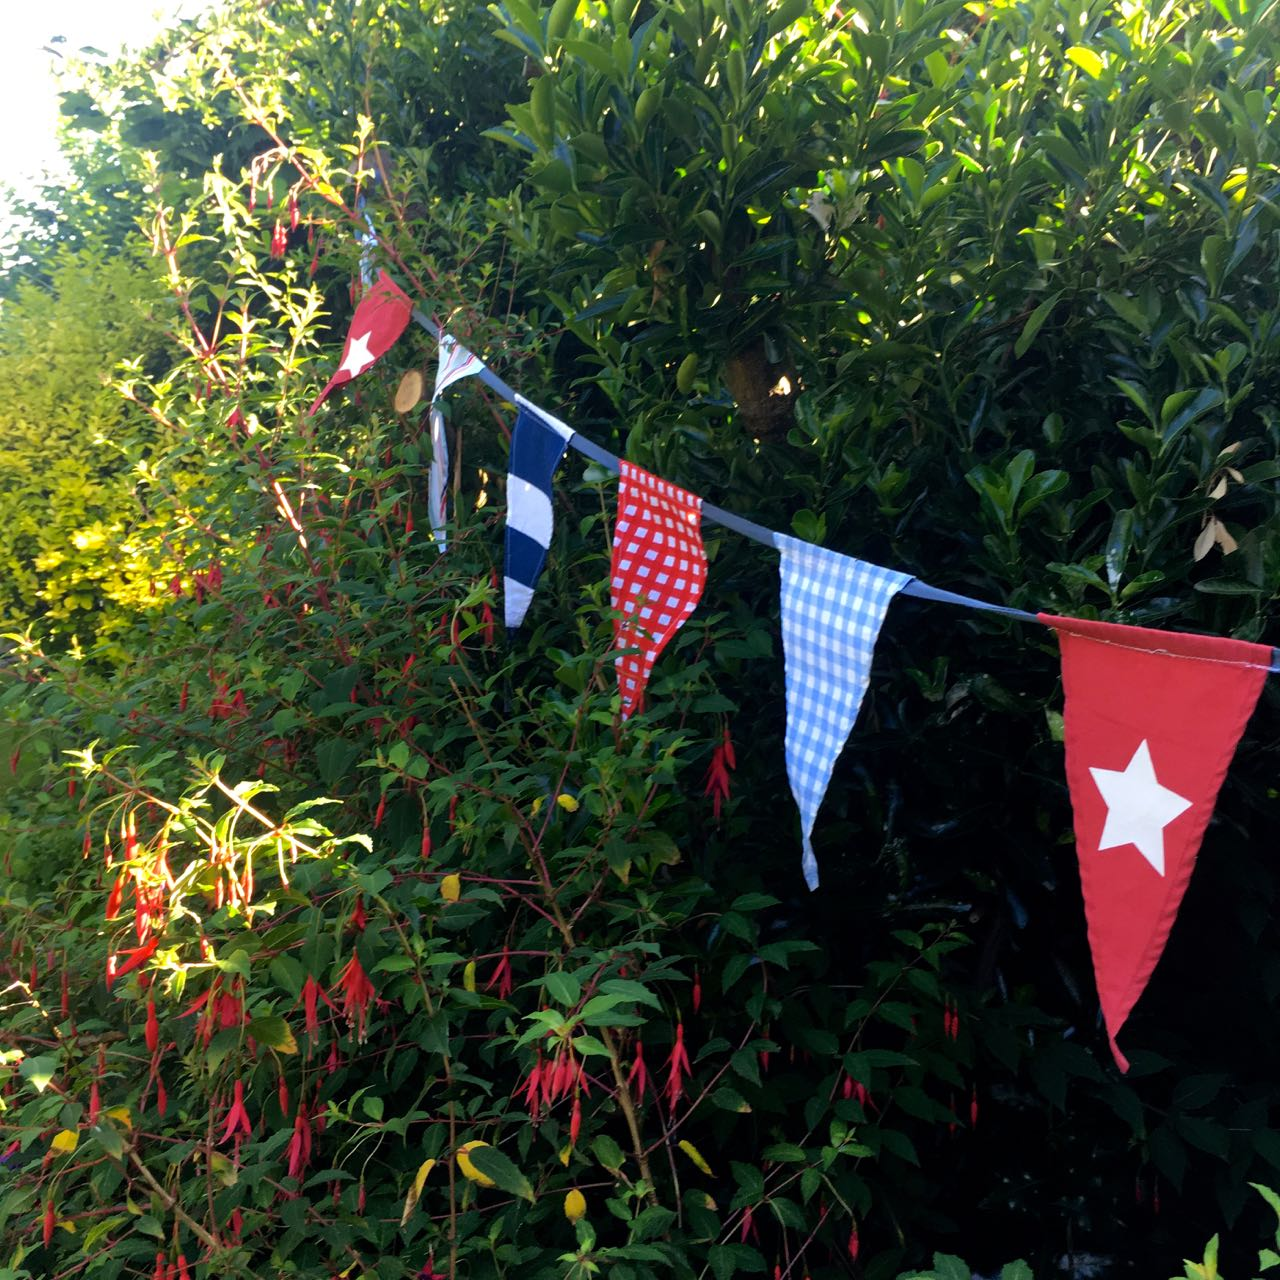 shop-bought bunting hanging ship-shape in the garden